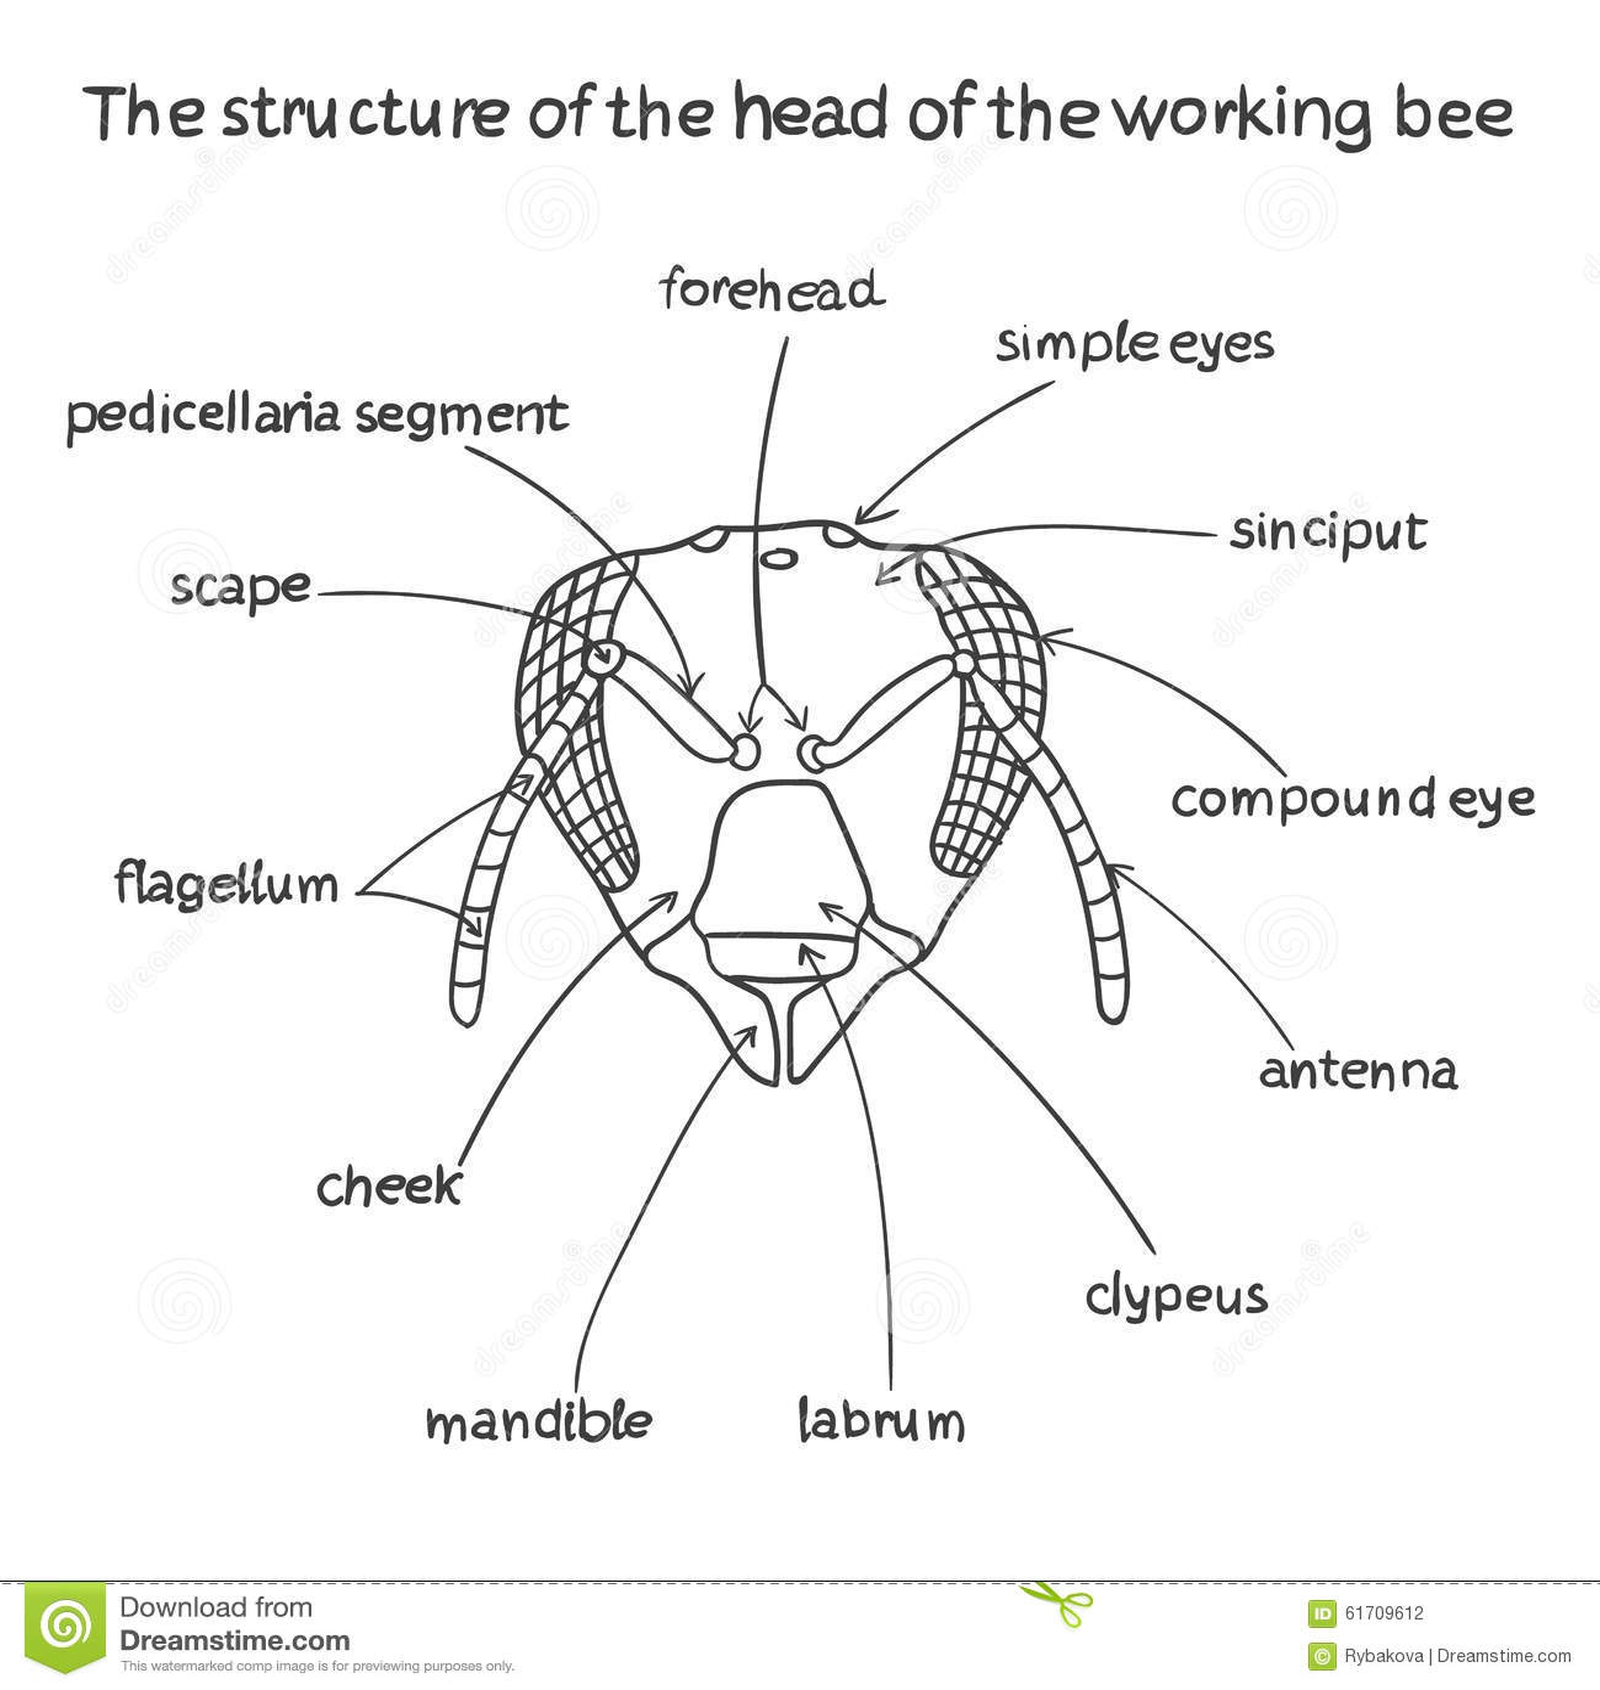 Anatomy of a beehive 1486229 - togelmaya.info